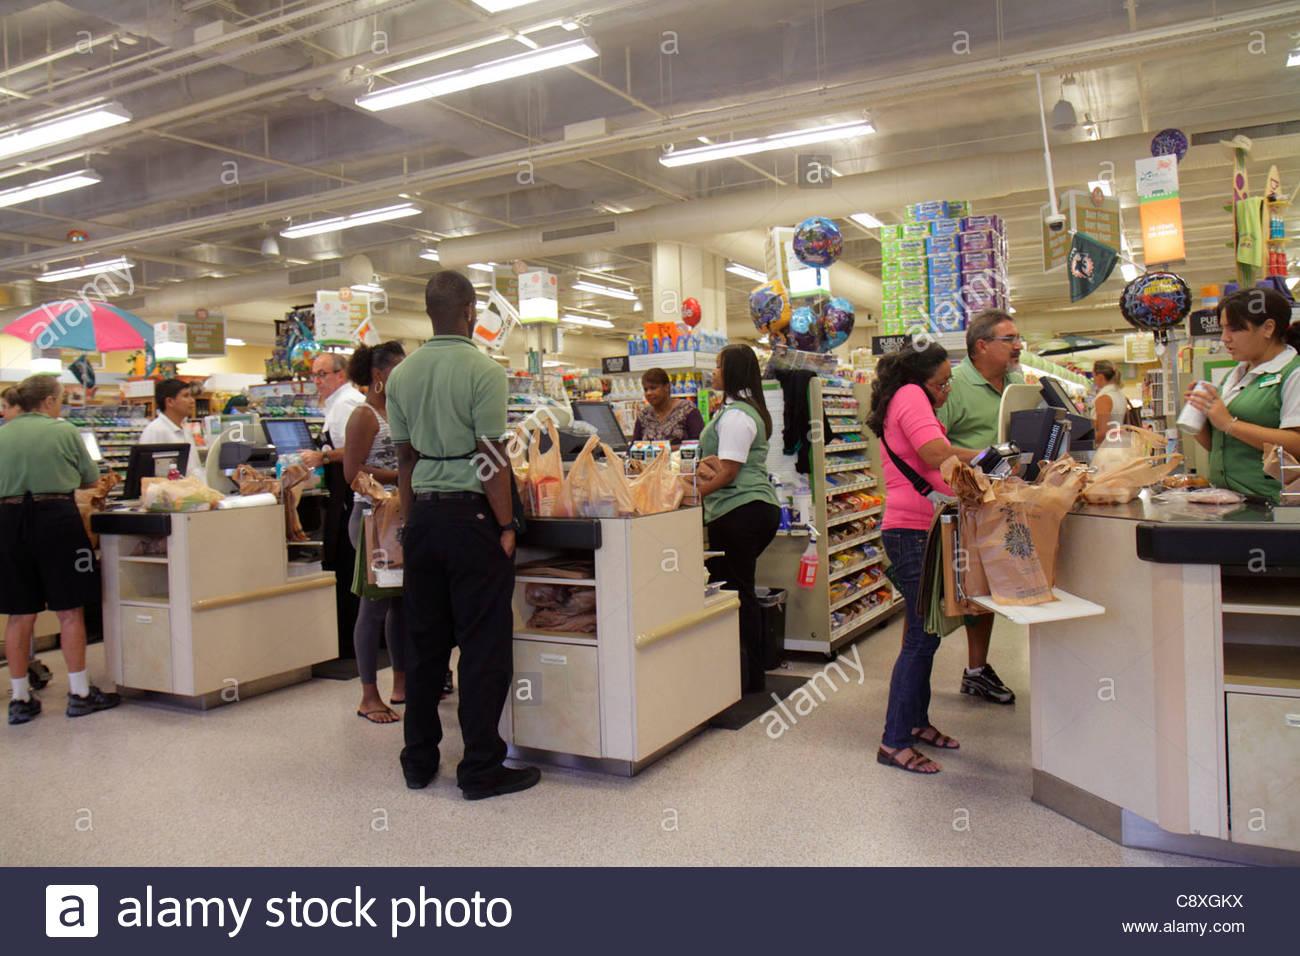 Supermarket cashier job description for resume - Resume tips skills